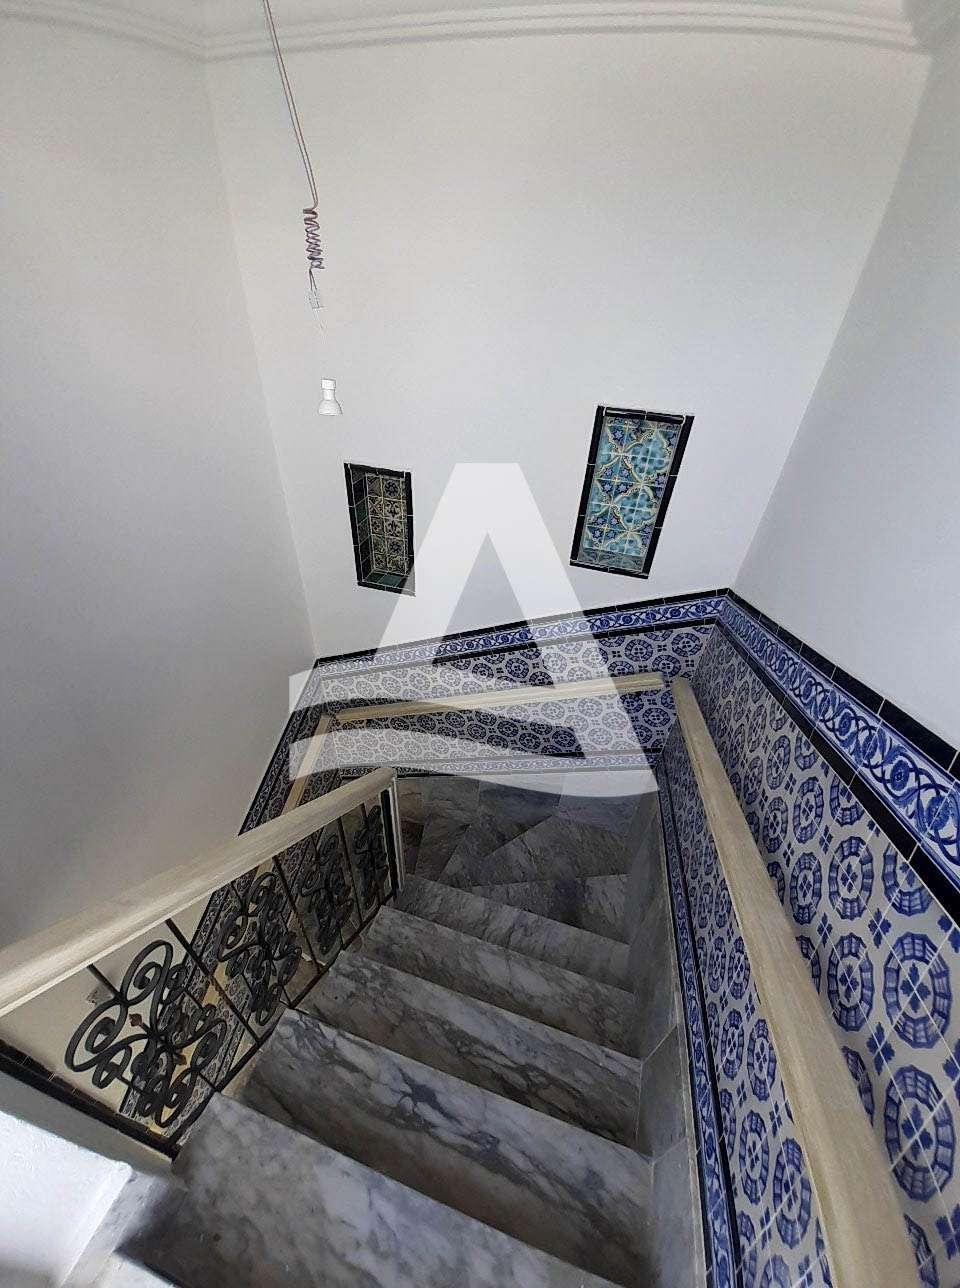 httpss3.amazonaws.comlogimoaws1772011091614686027Appartement_Marsa_Tunisie_-10